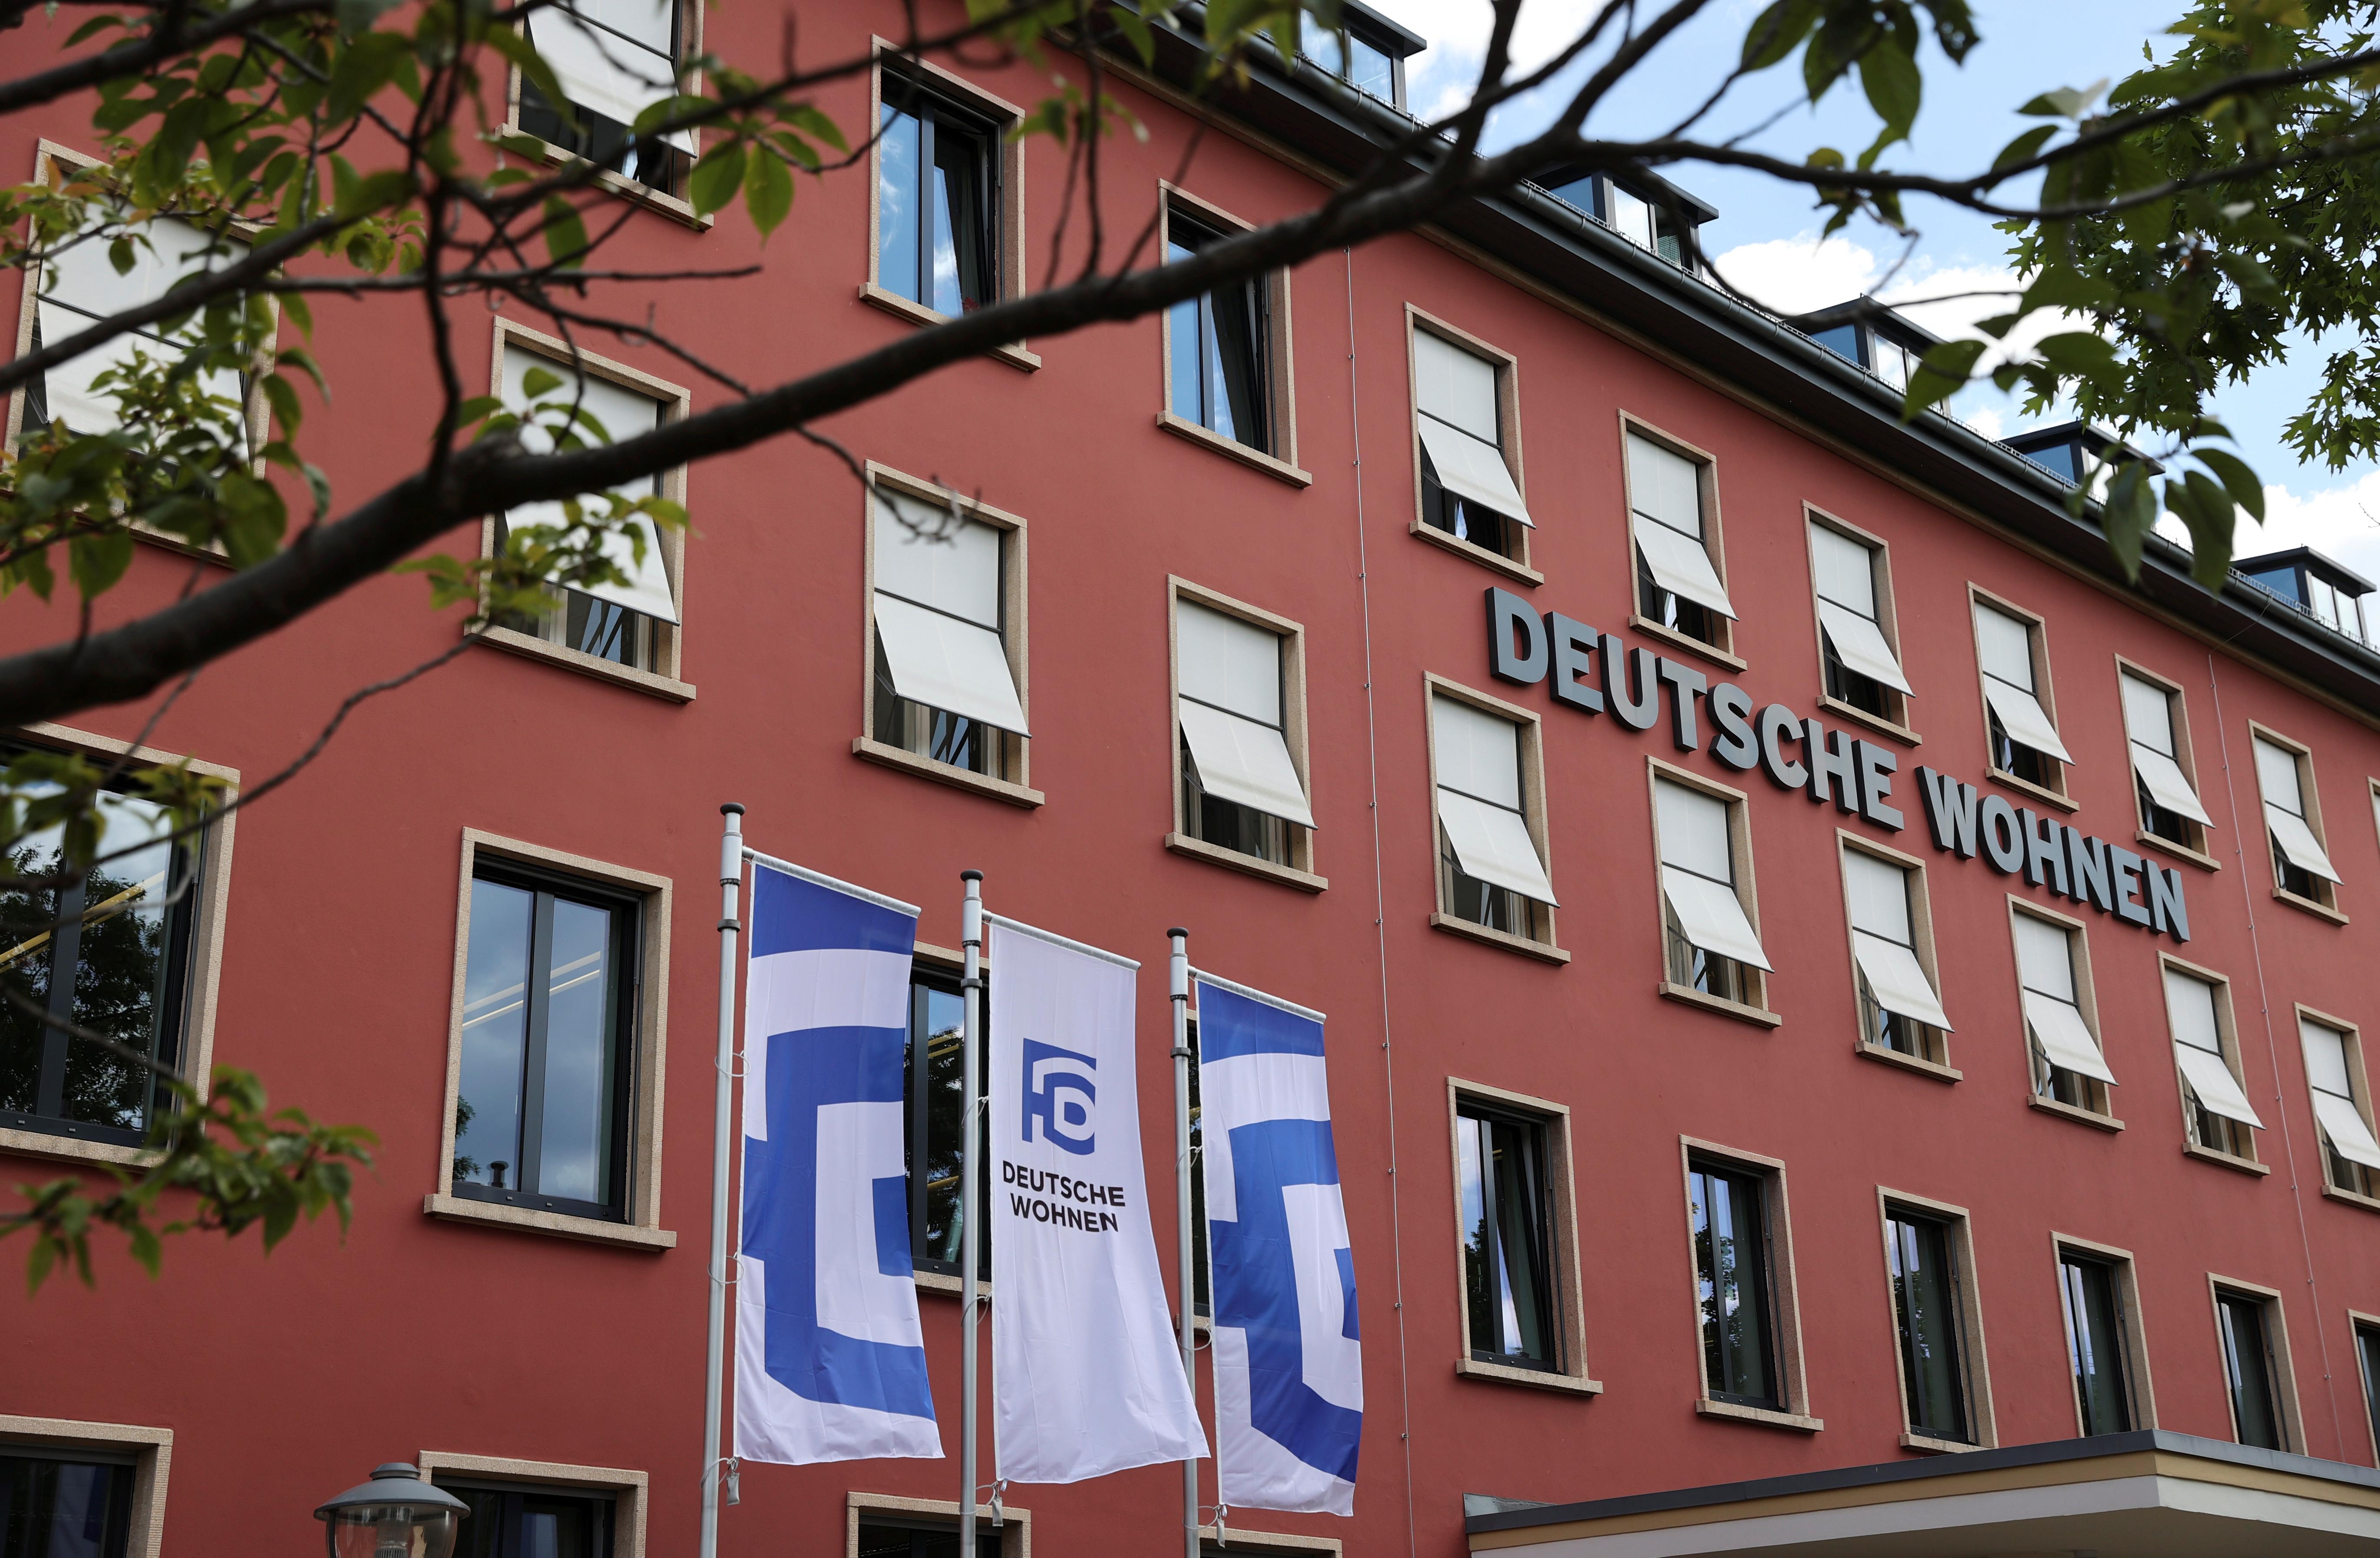 An office building of the German property group Deutsche Wohnen is pictured in Berlin, Germany June 2, 2020.